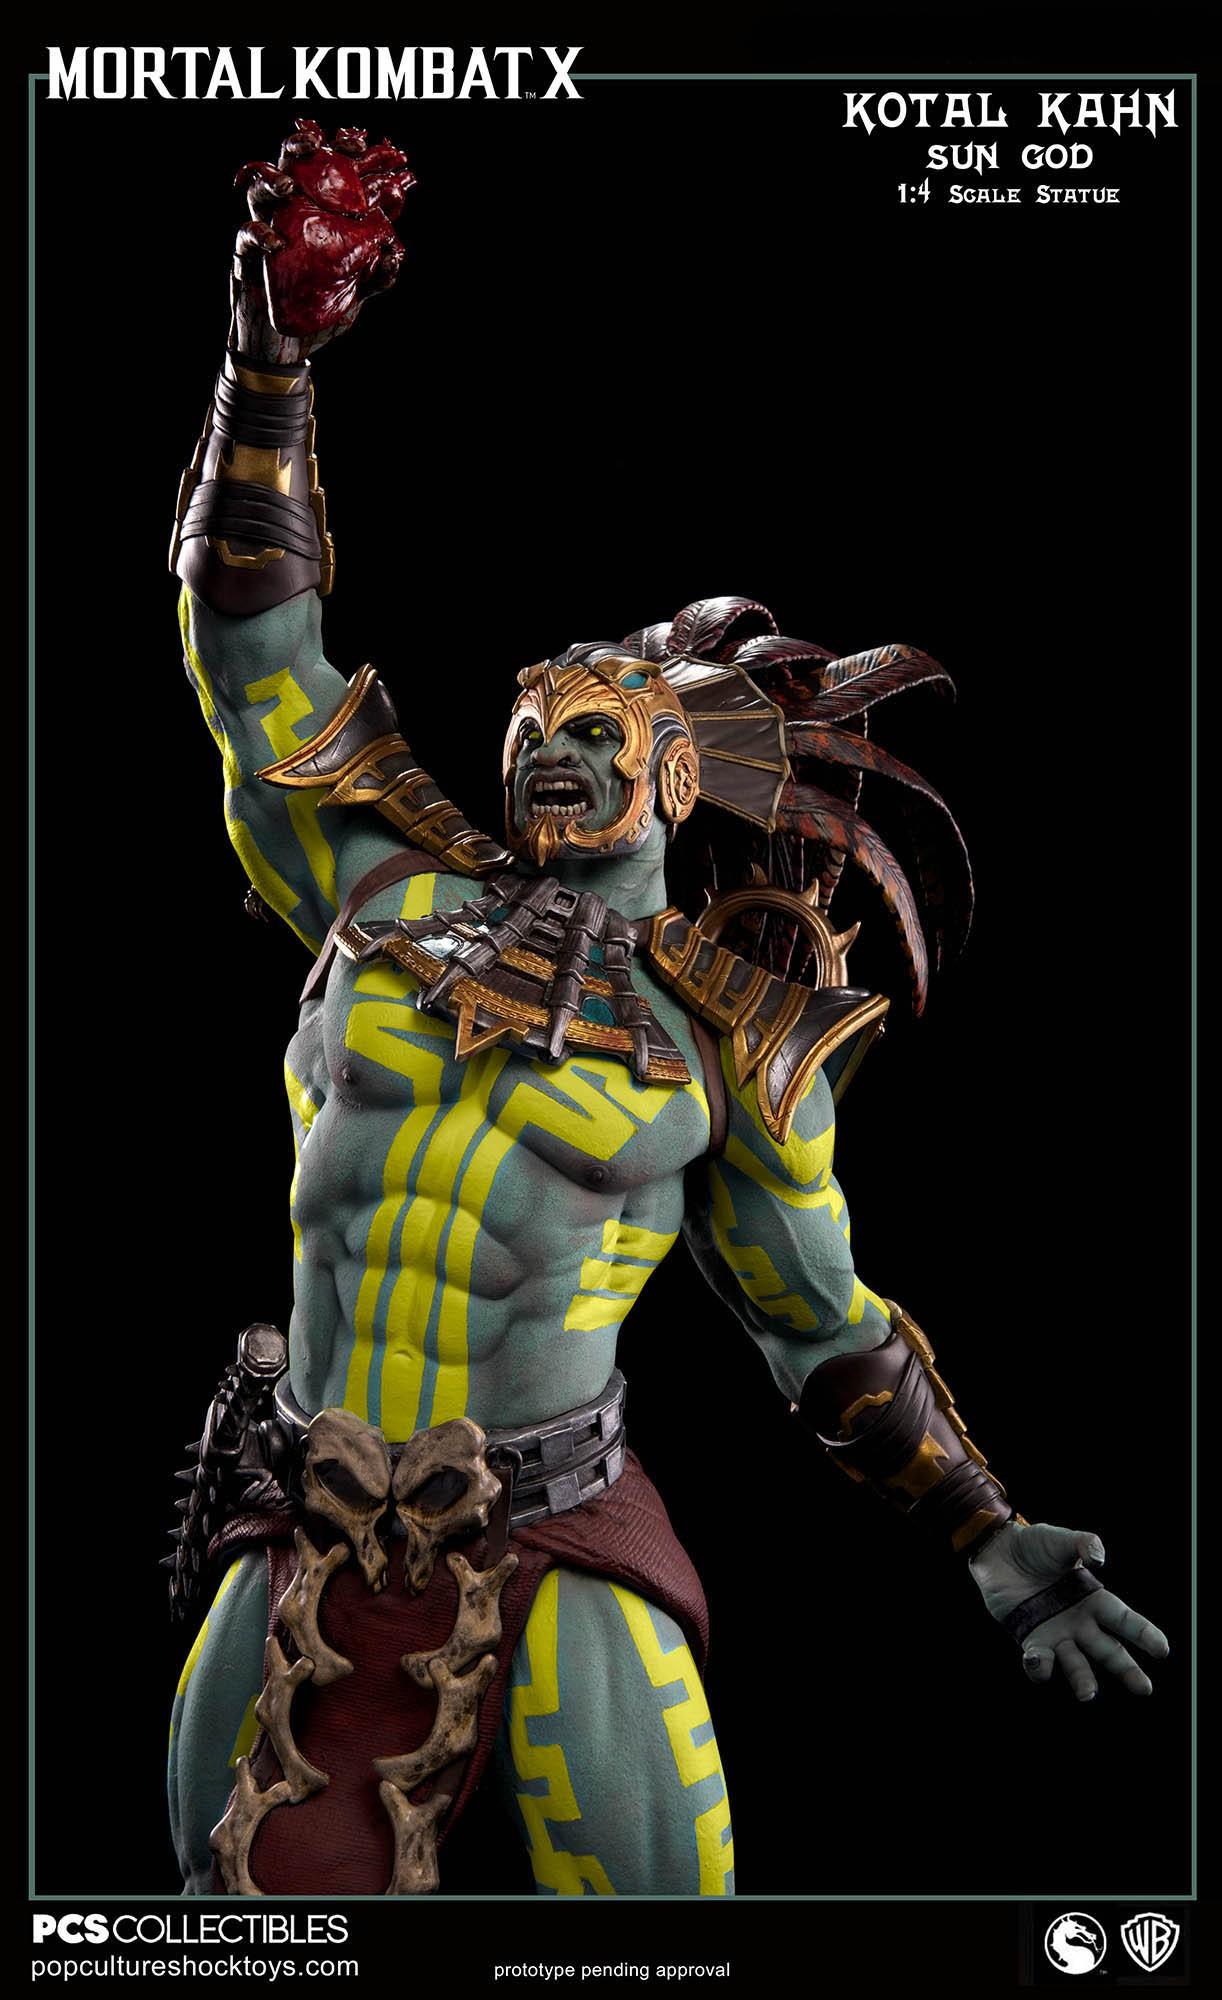 [Pop Culture Shock] Mortal Kombat X: Kotal Kahn 1:4 scale PCS-Kotal-Kahn-Sun-God-019